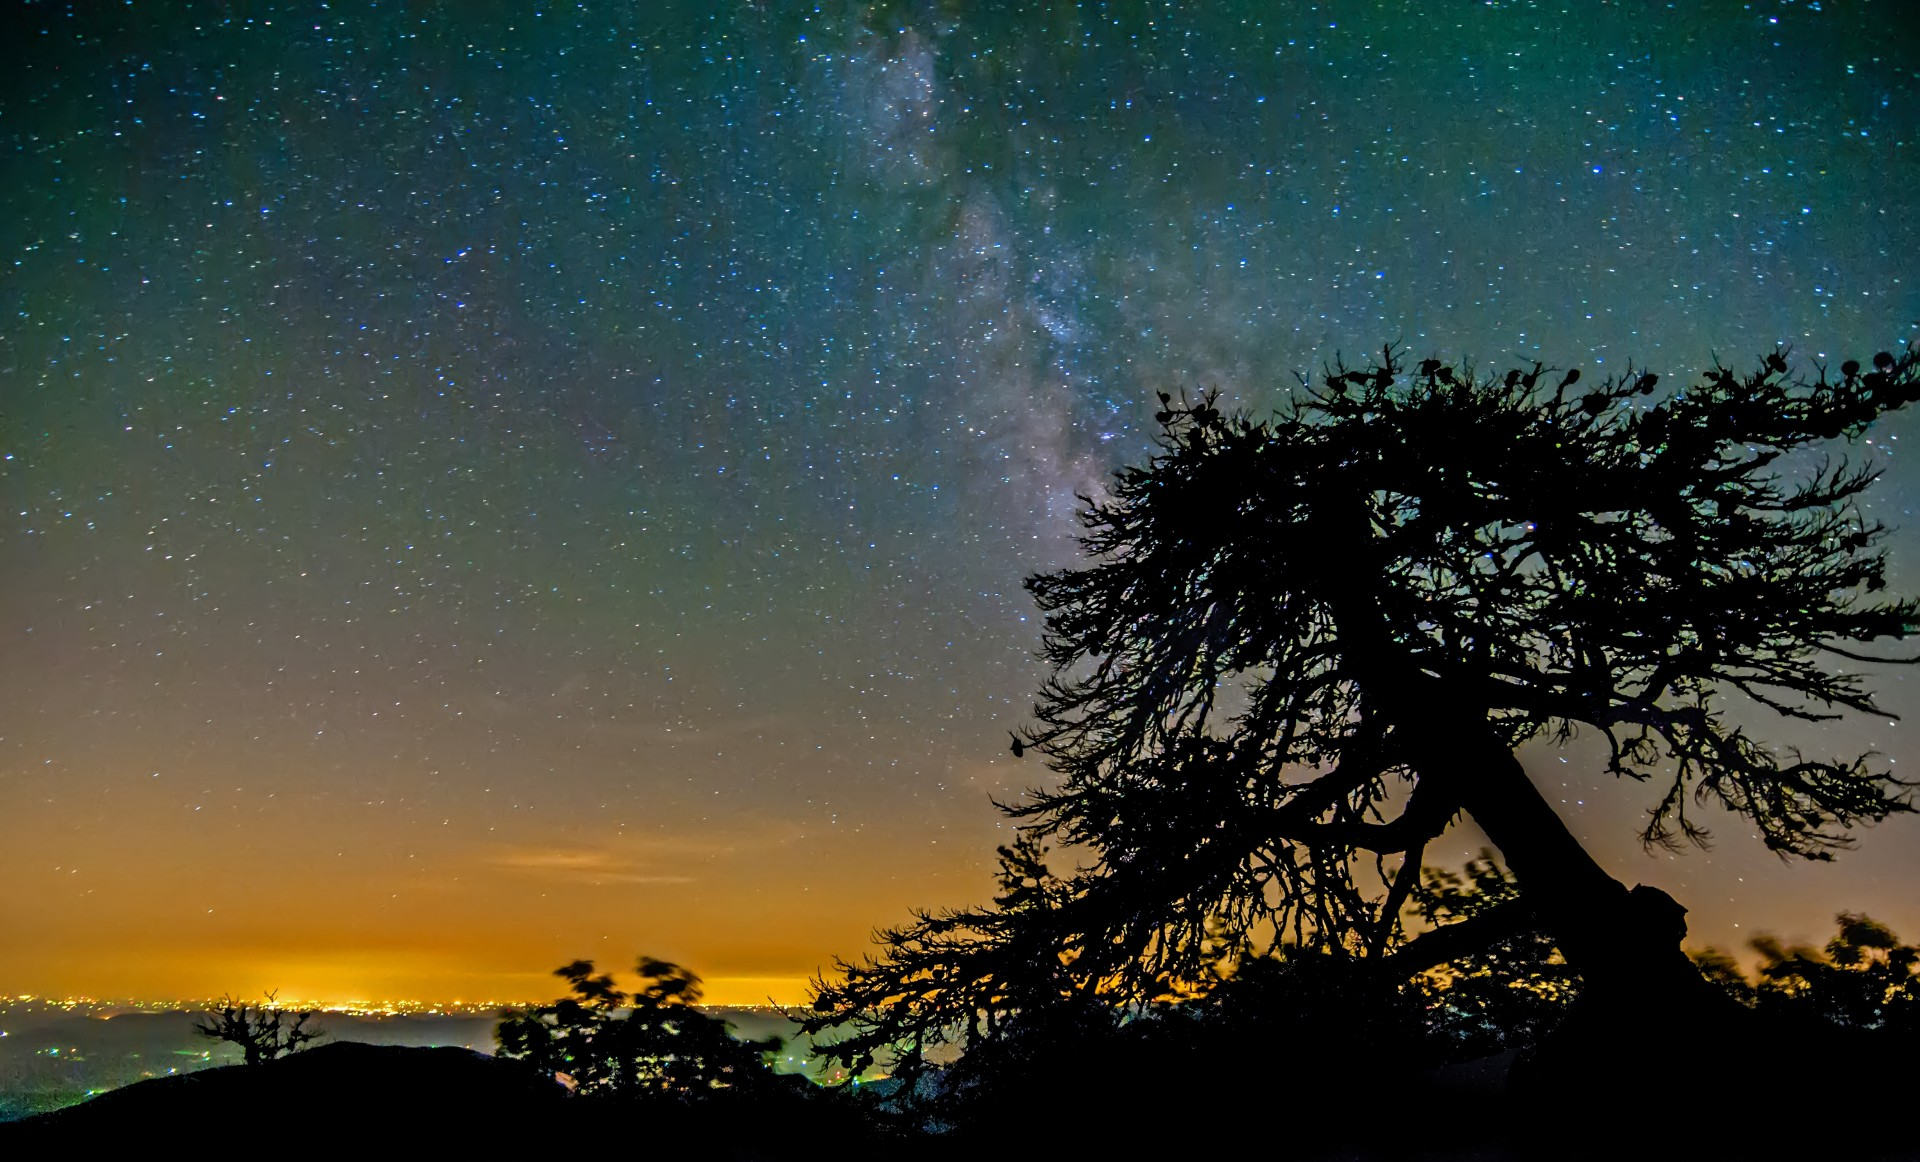 night-sky-in-mountains.jpg